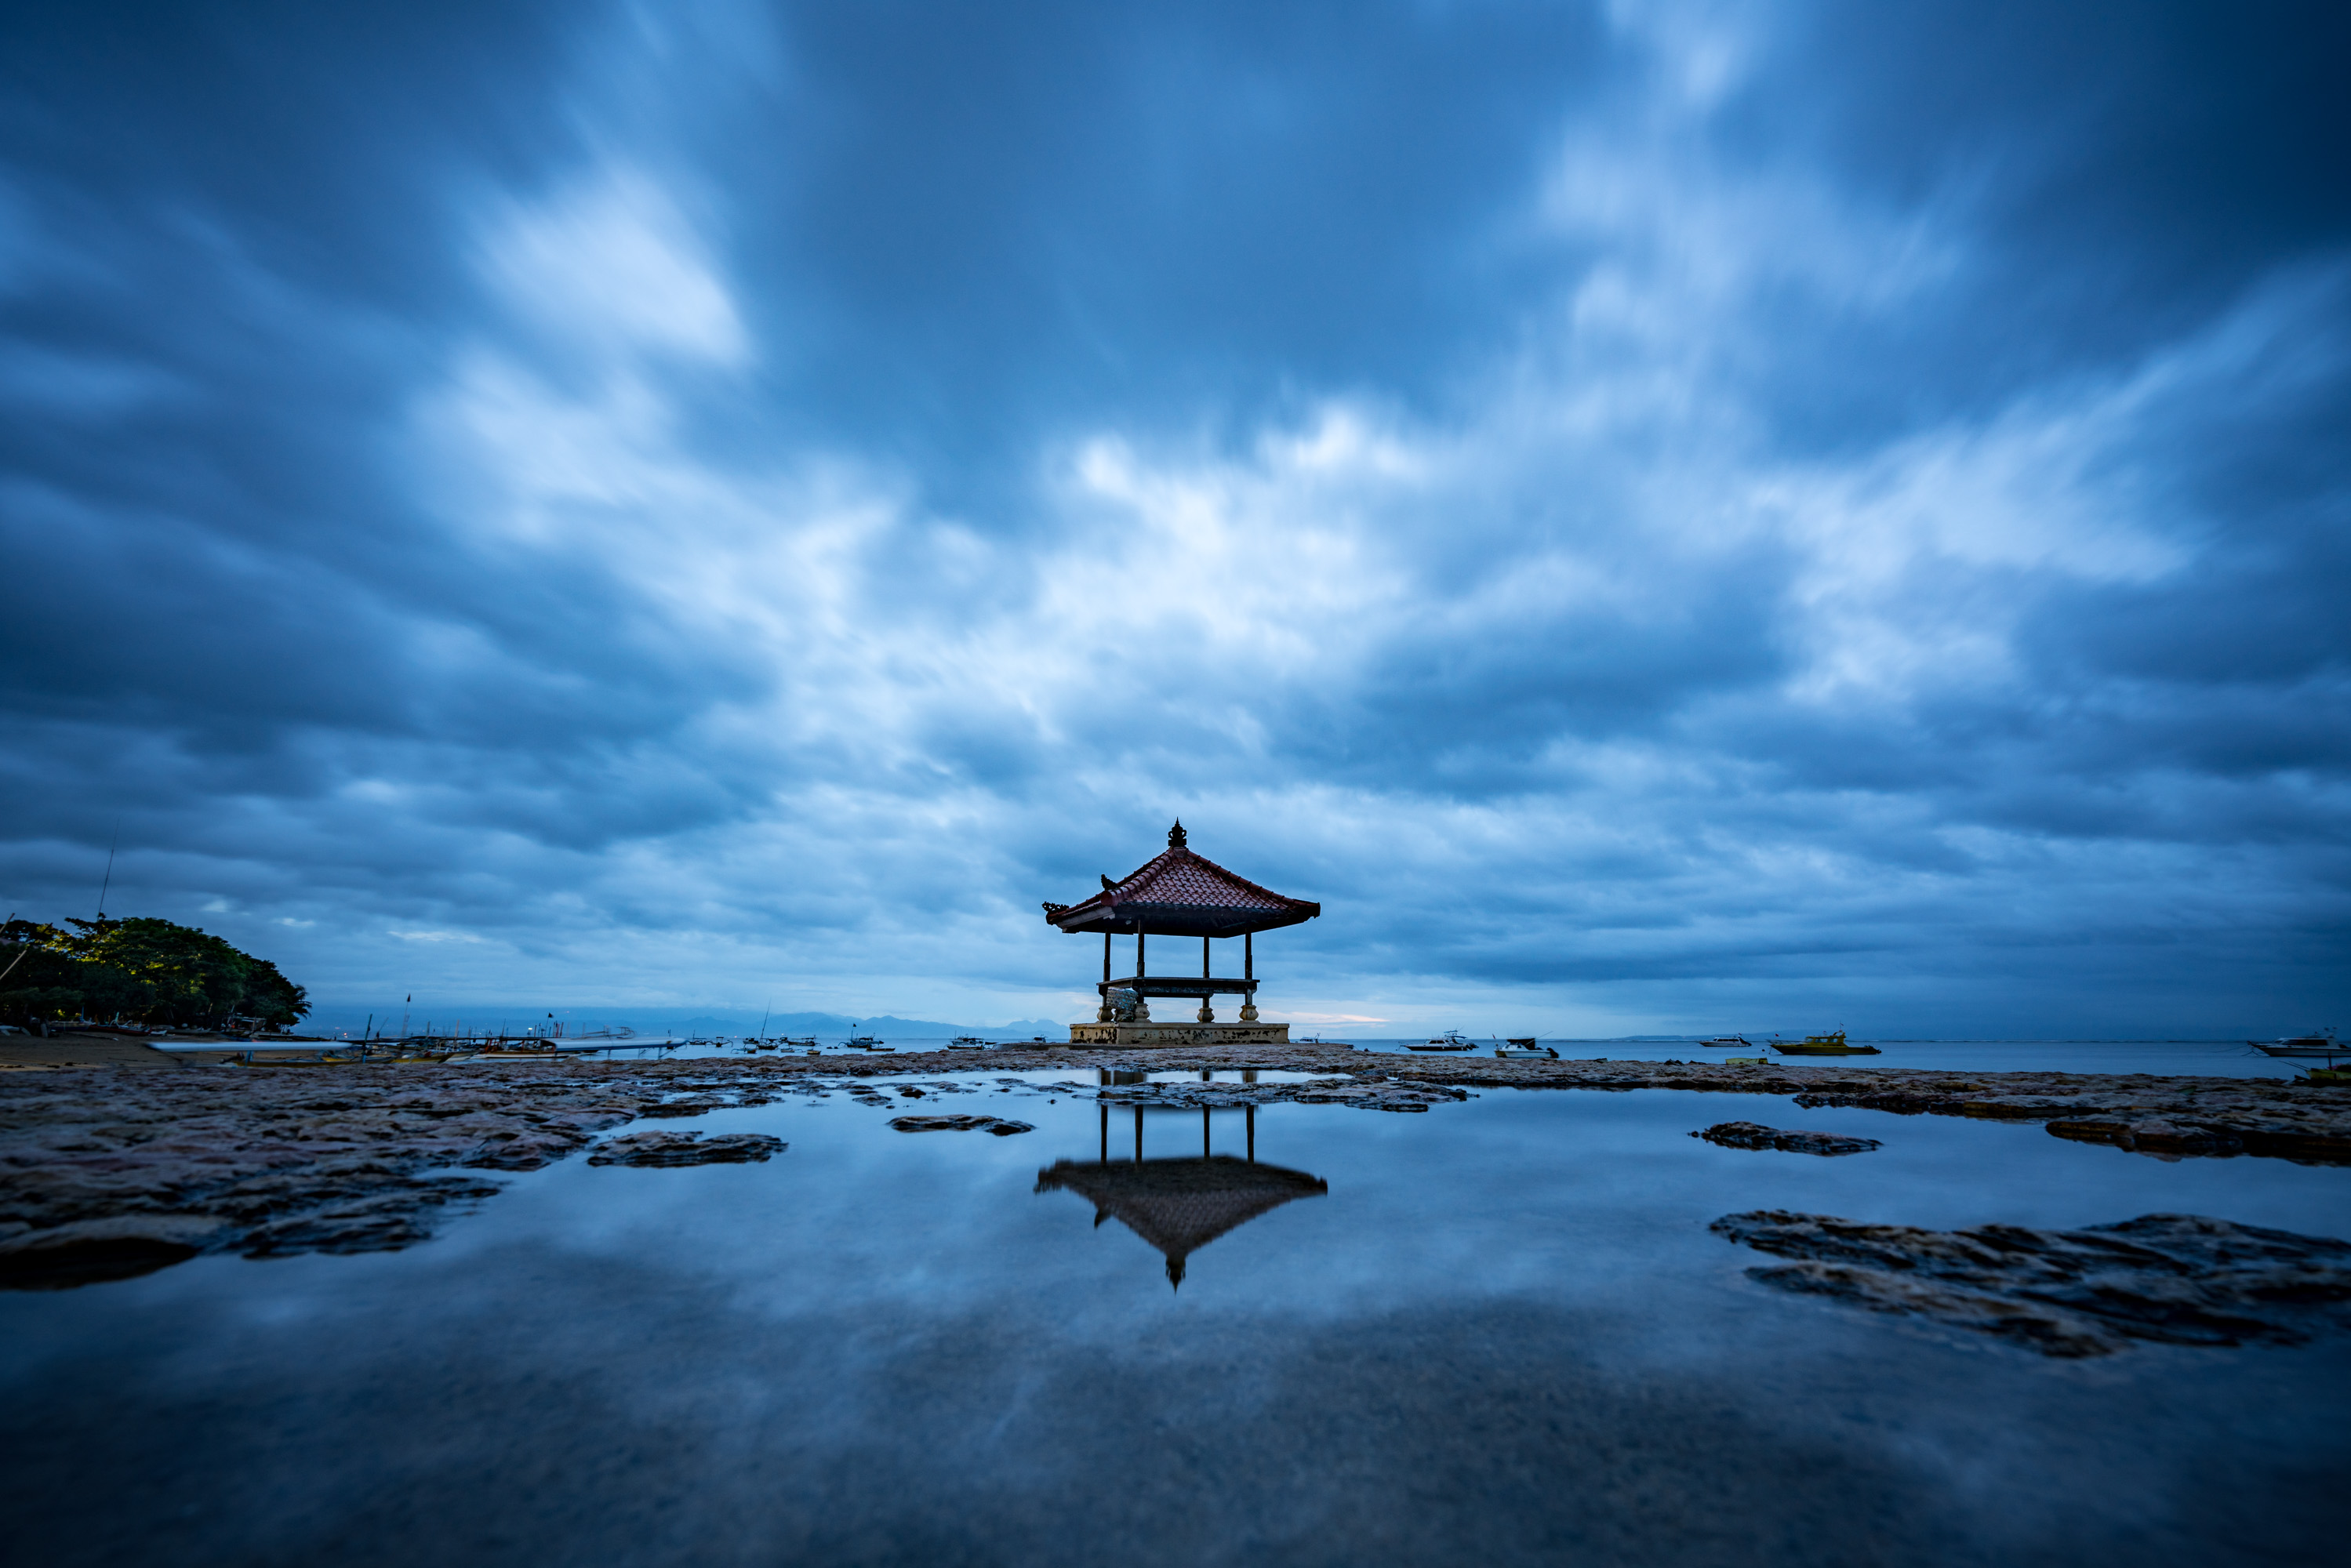 house in Bali Beach [David Tan]